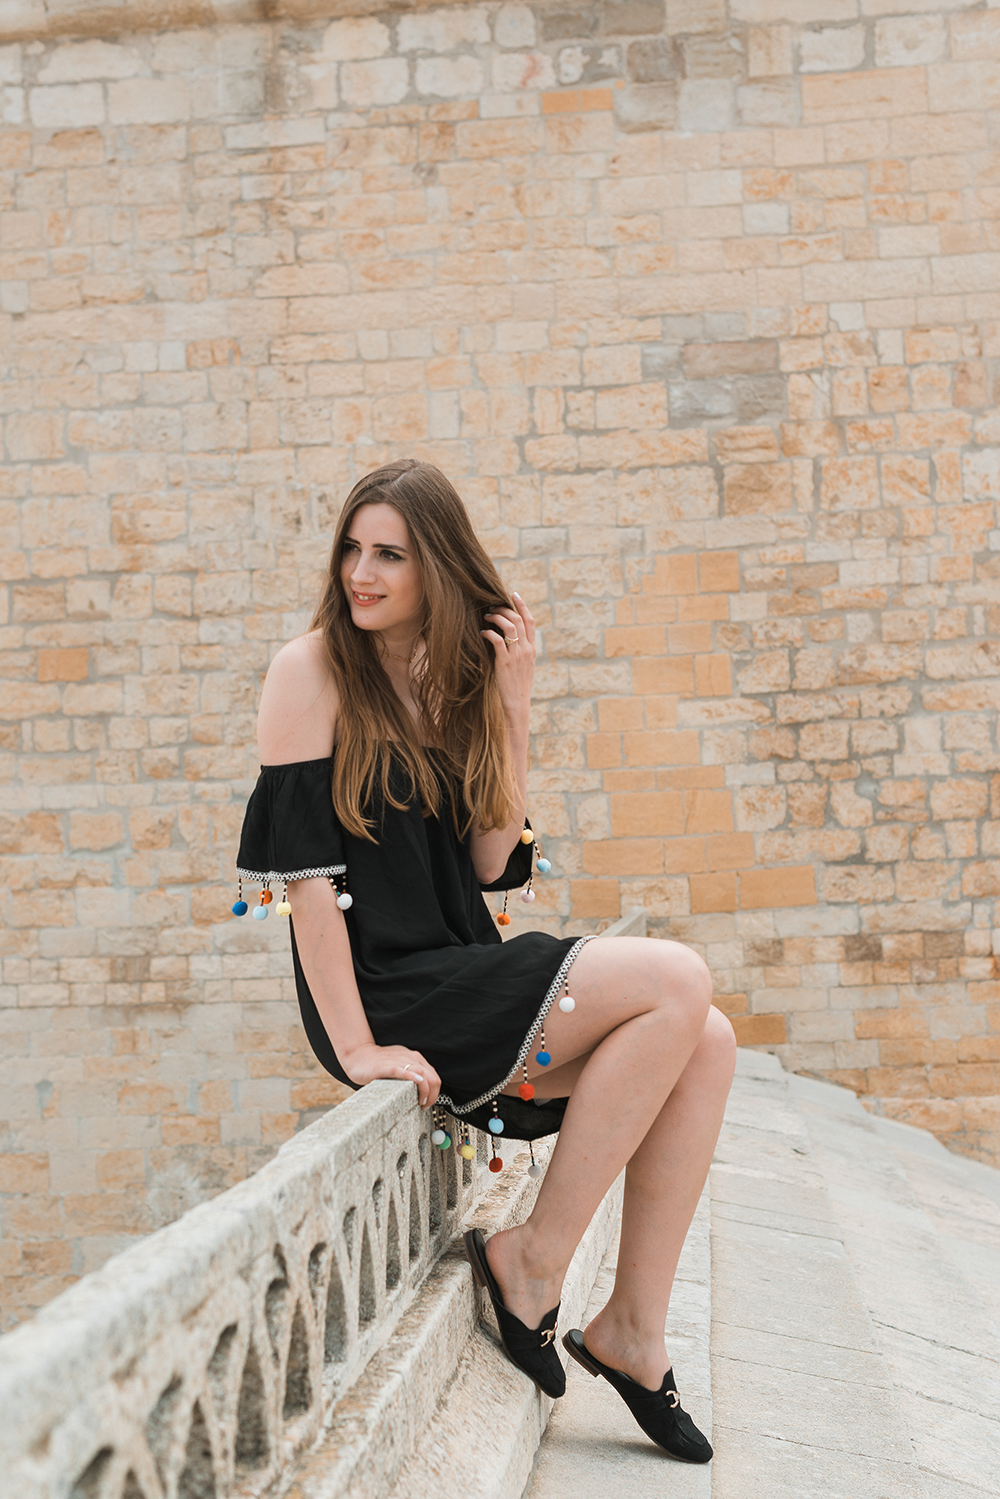 andysparkles-Fashionblogger-Kleid mit Bommeln-Sommer 2017